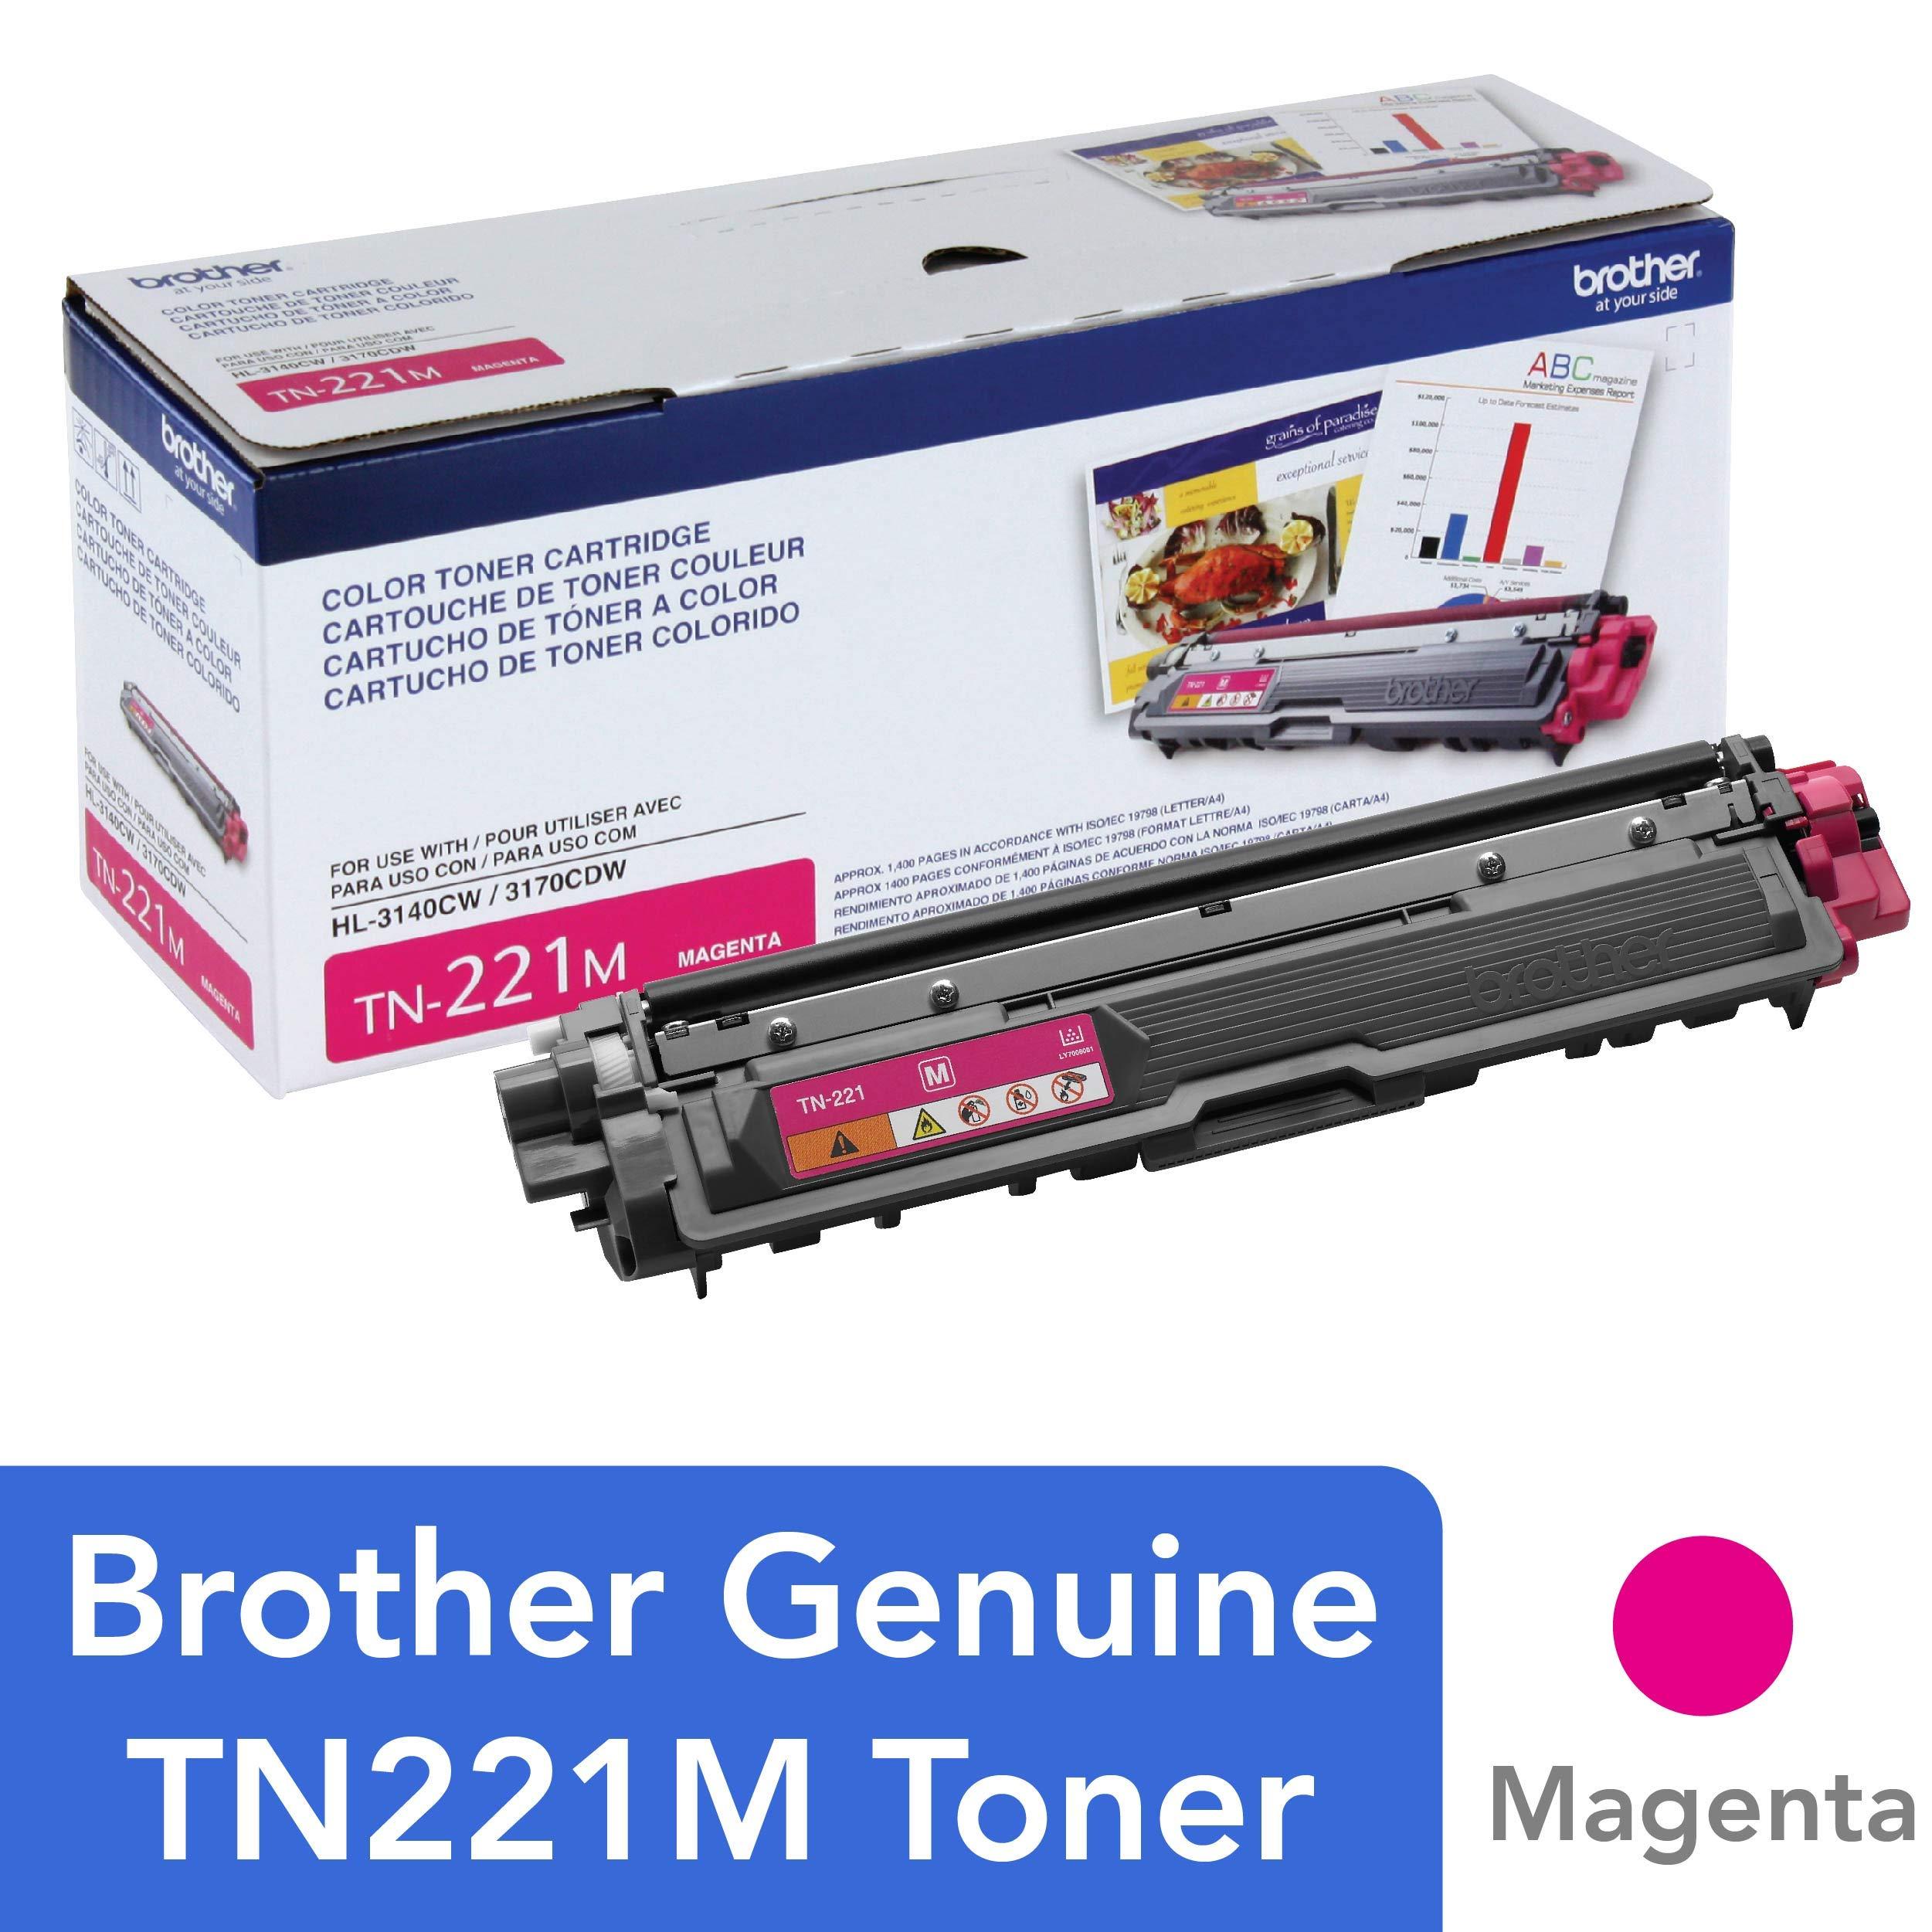 Toner Original BROTHER TN-221M DCP-9015 9020 HL-3140 3150 3170 3180 MFC-9130 9140 9330 9340 (Magenta)